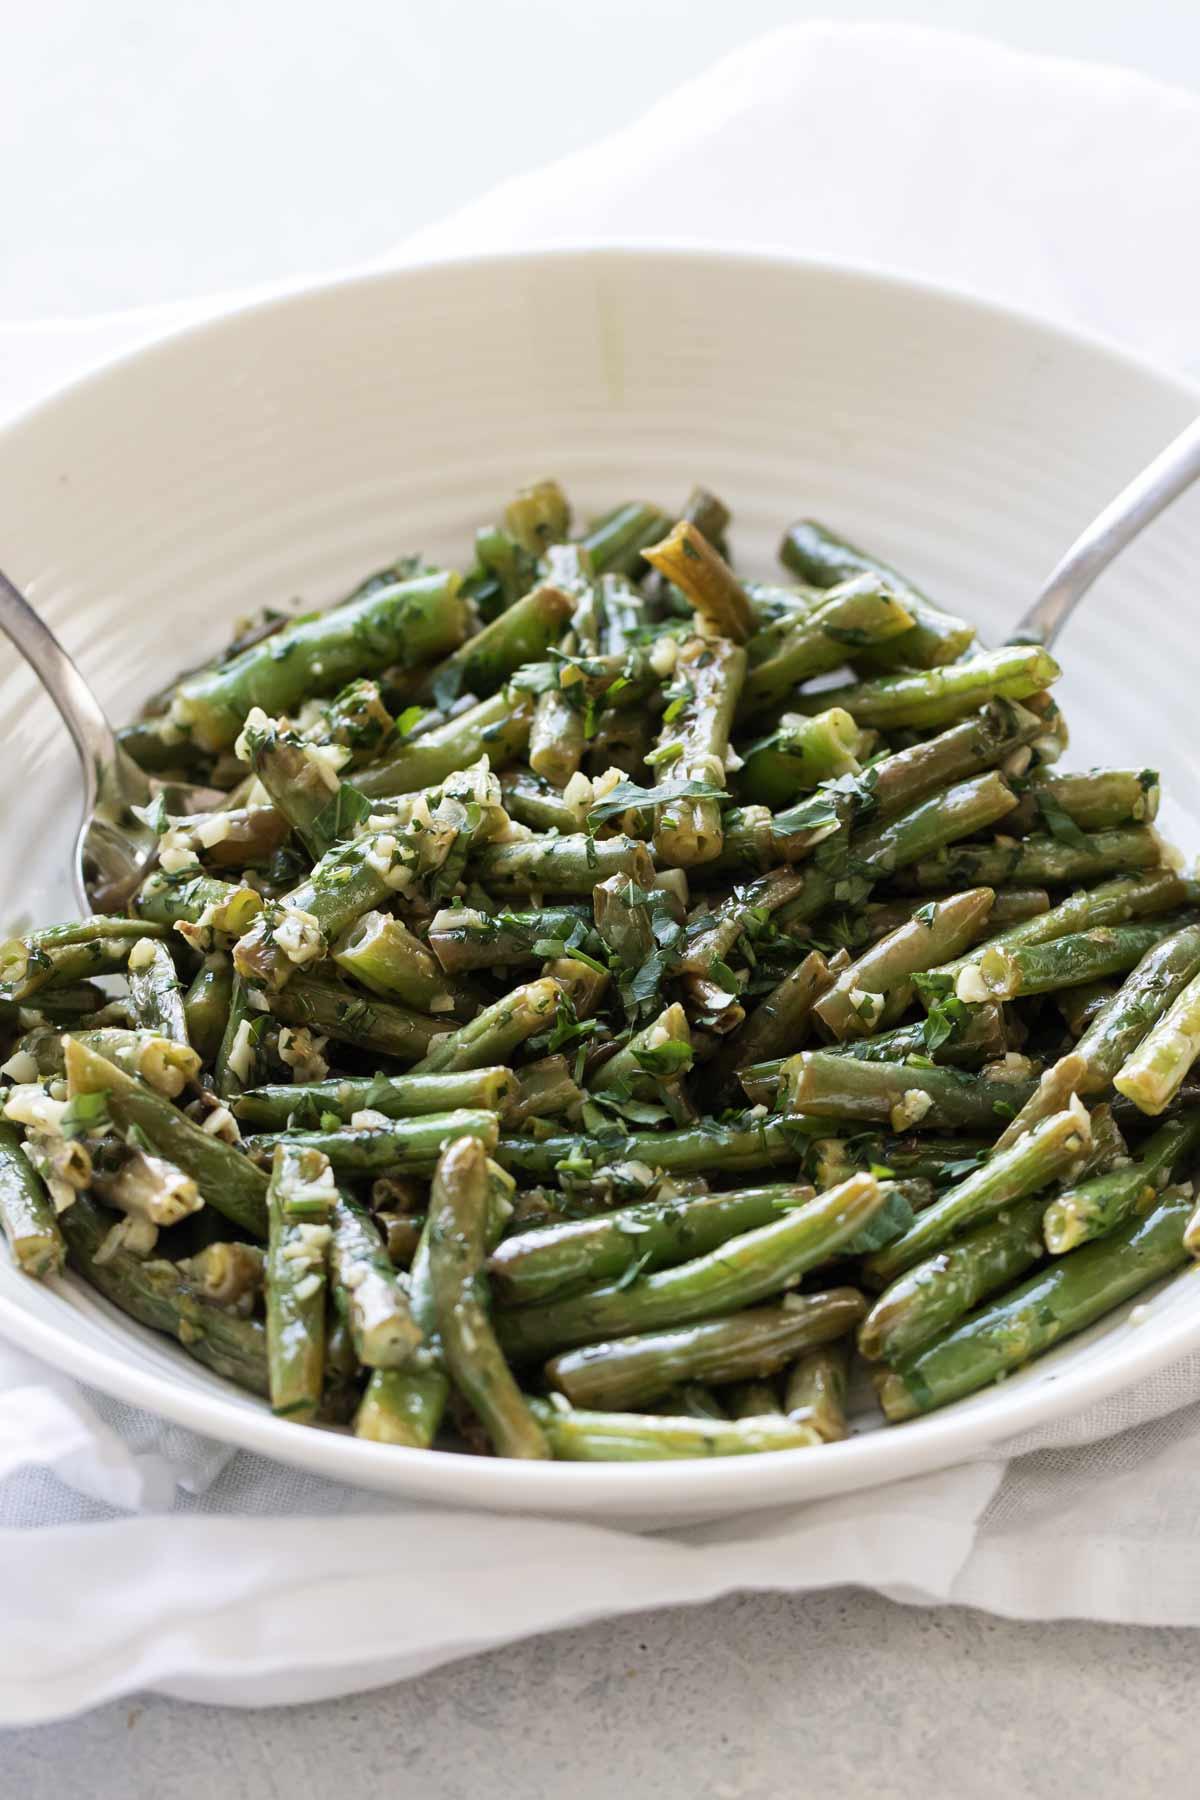 garlic-lemon green beans in a serving bowl